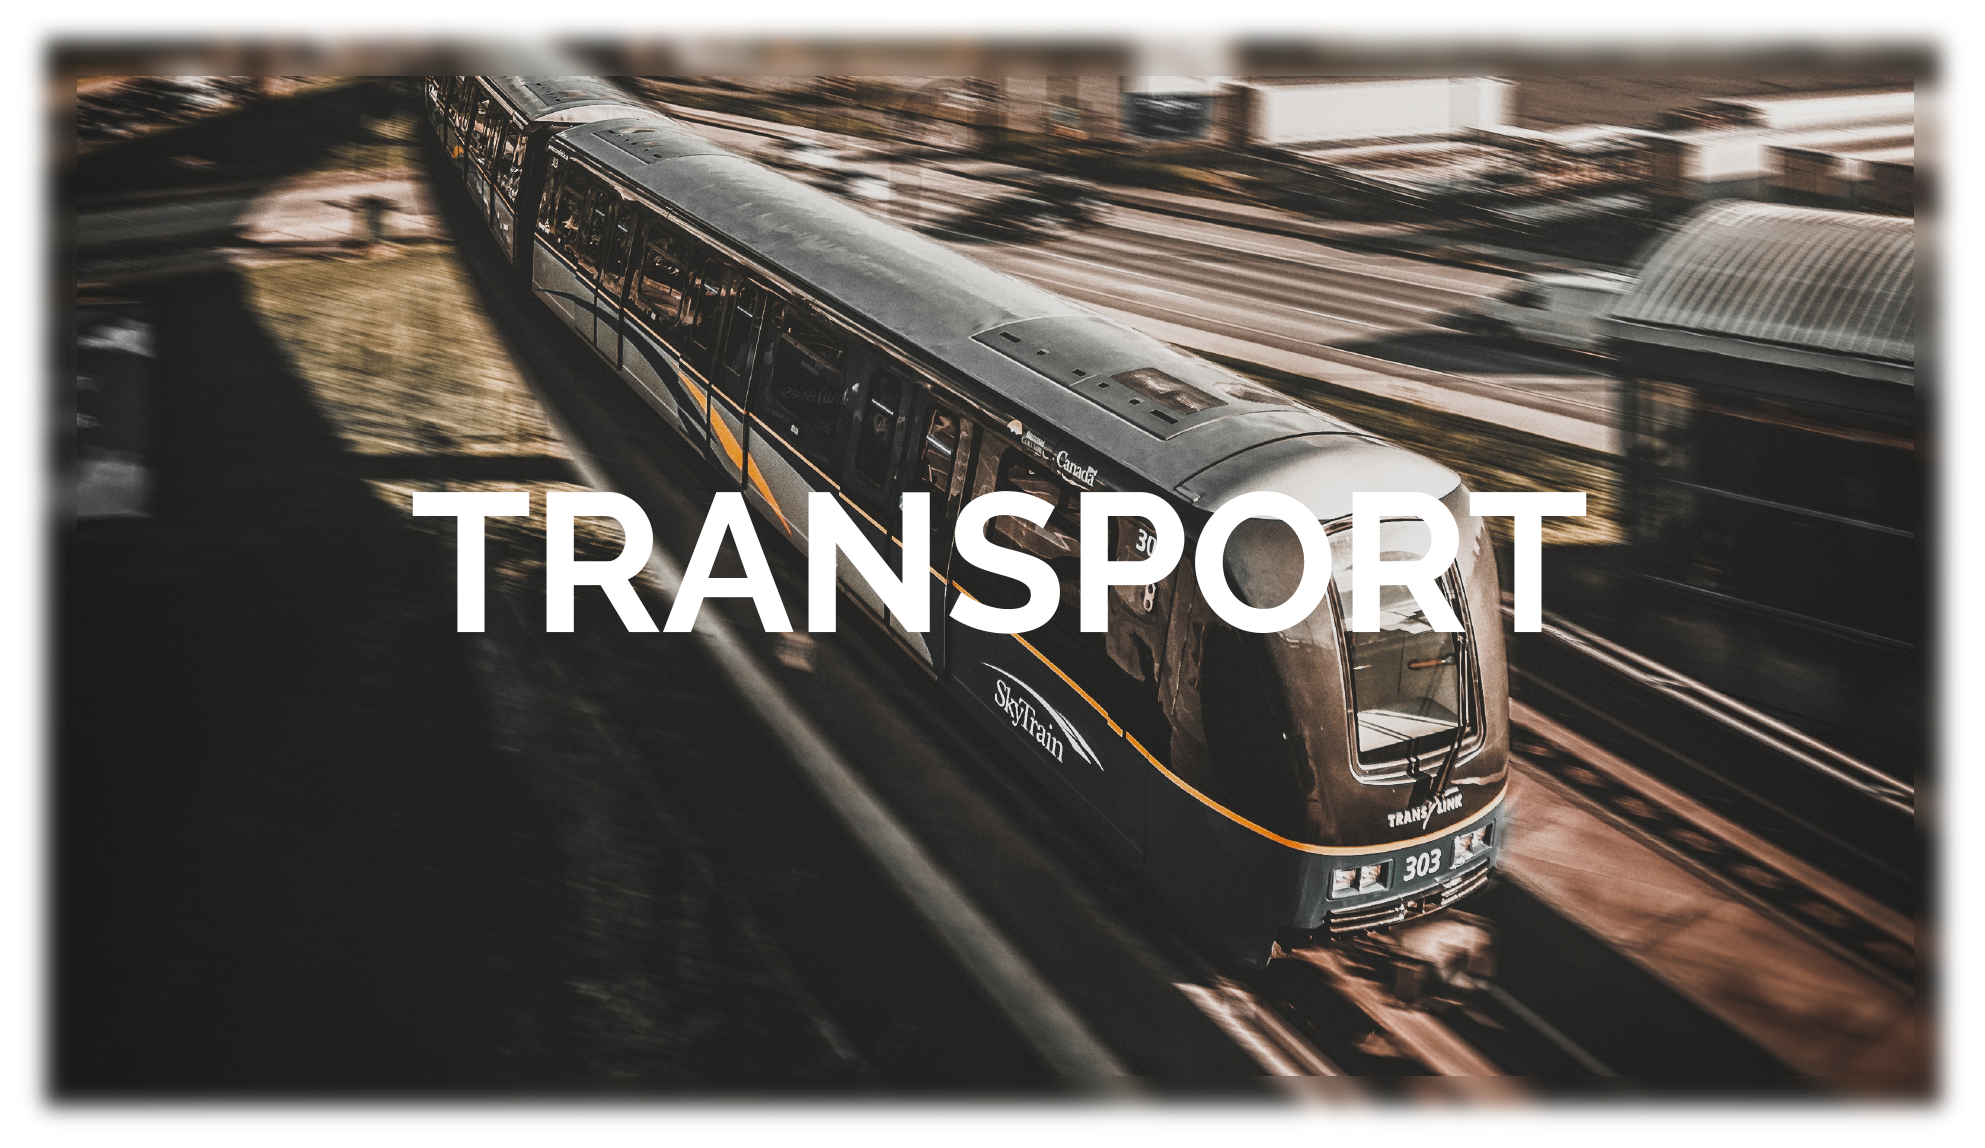 transportdef2